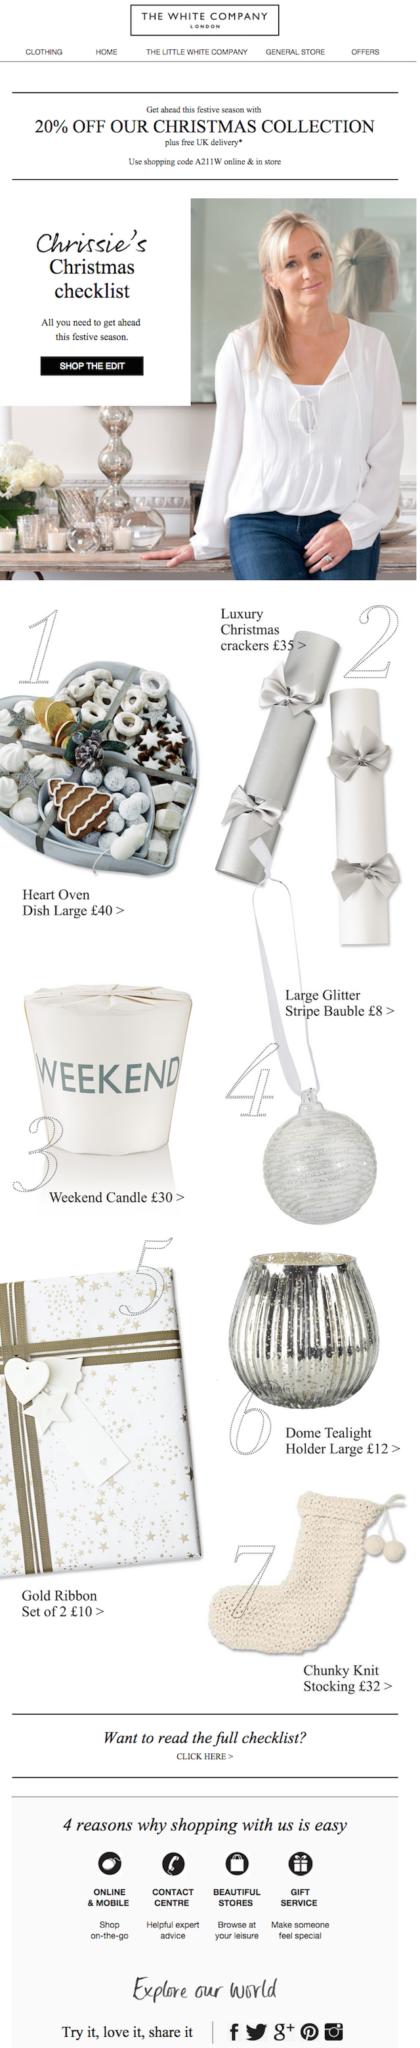 checklist newsletter perfectas para Navidad